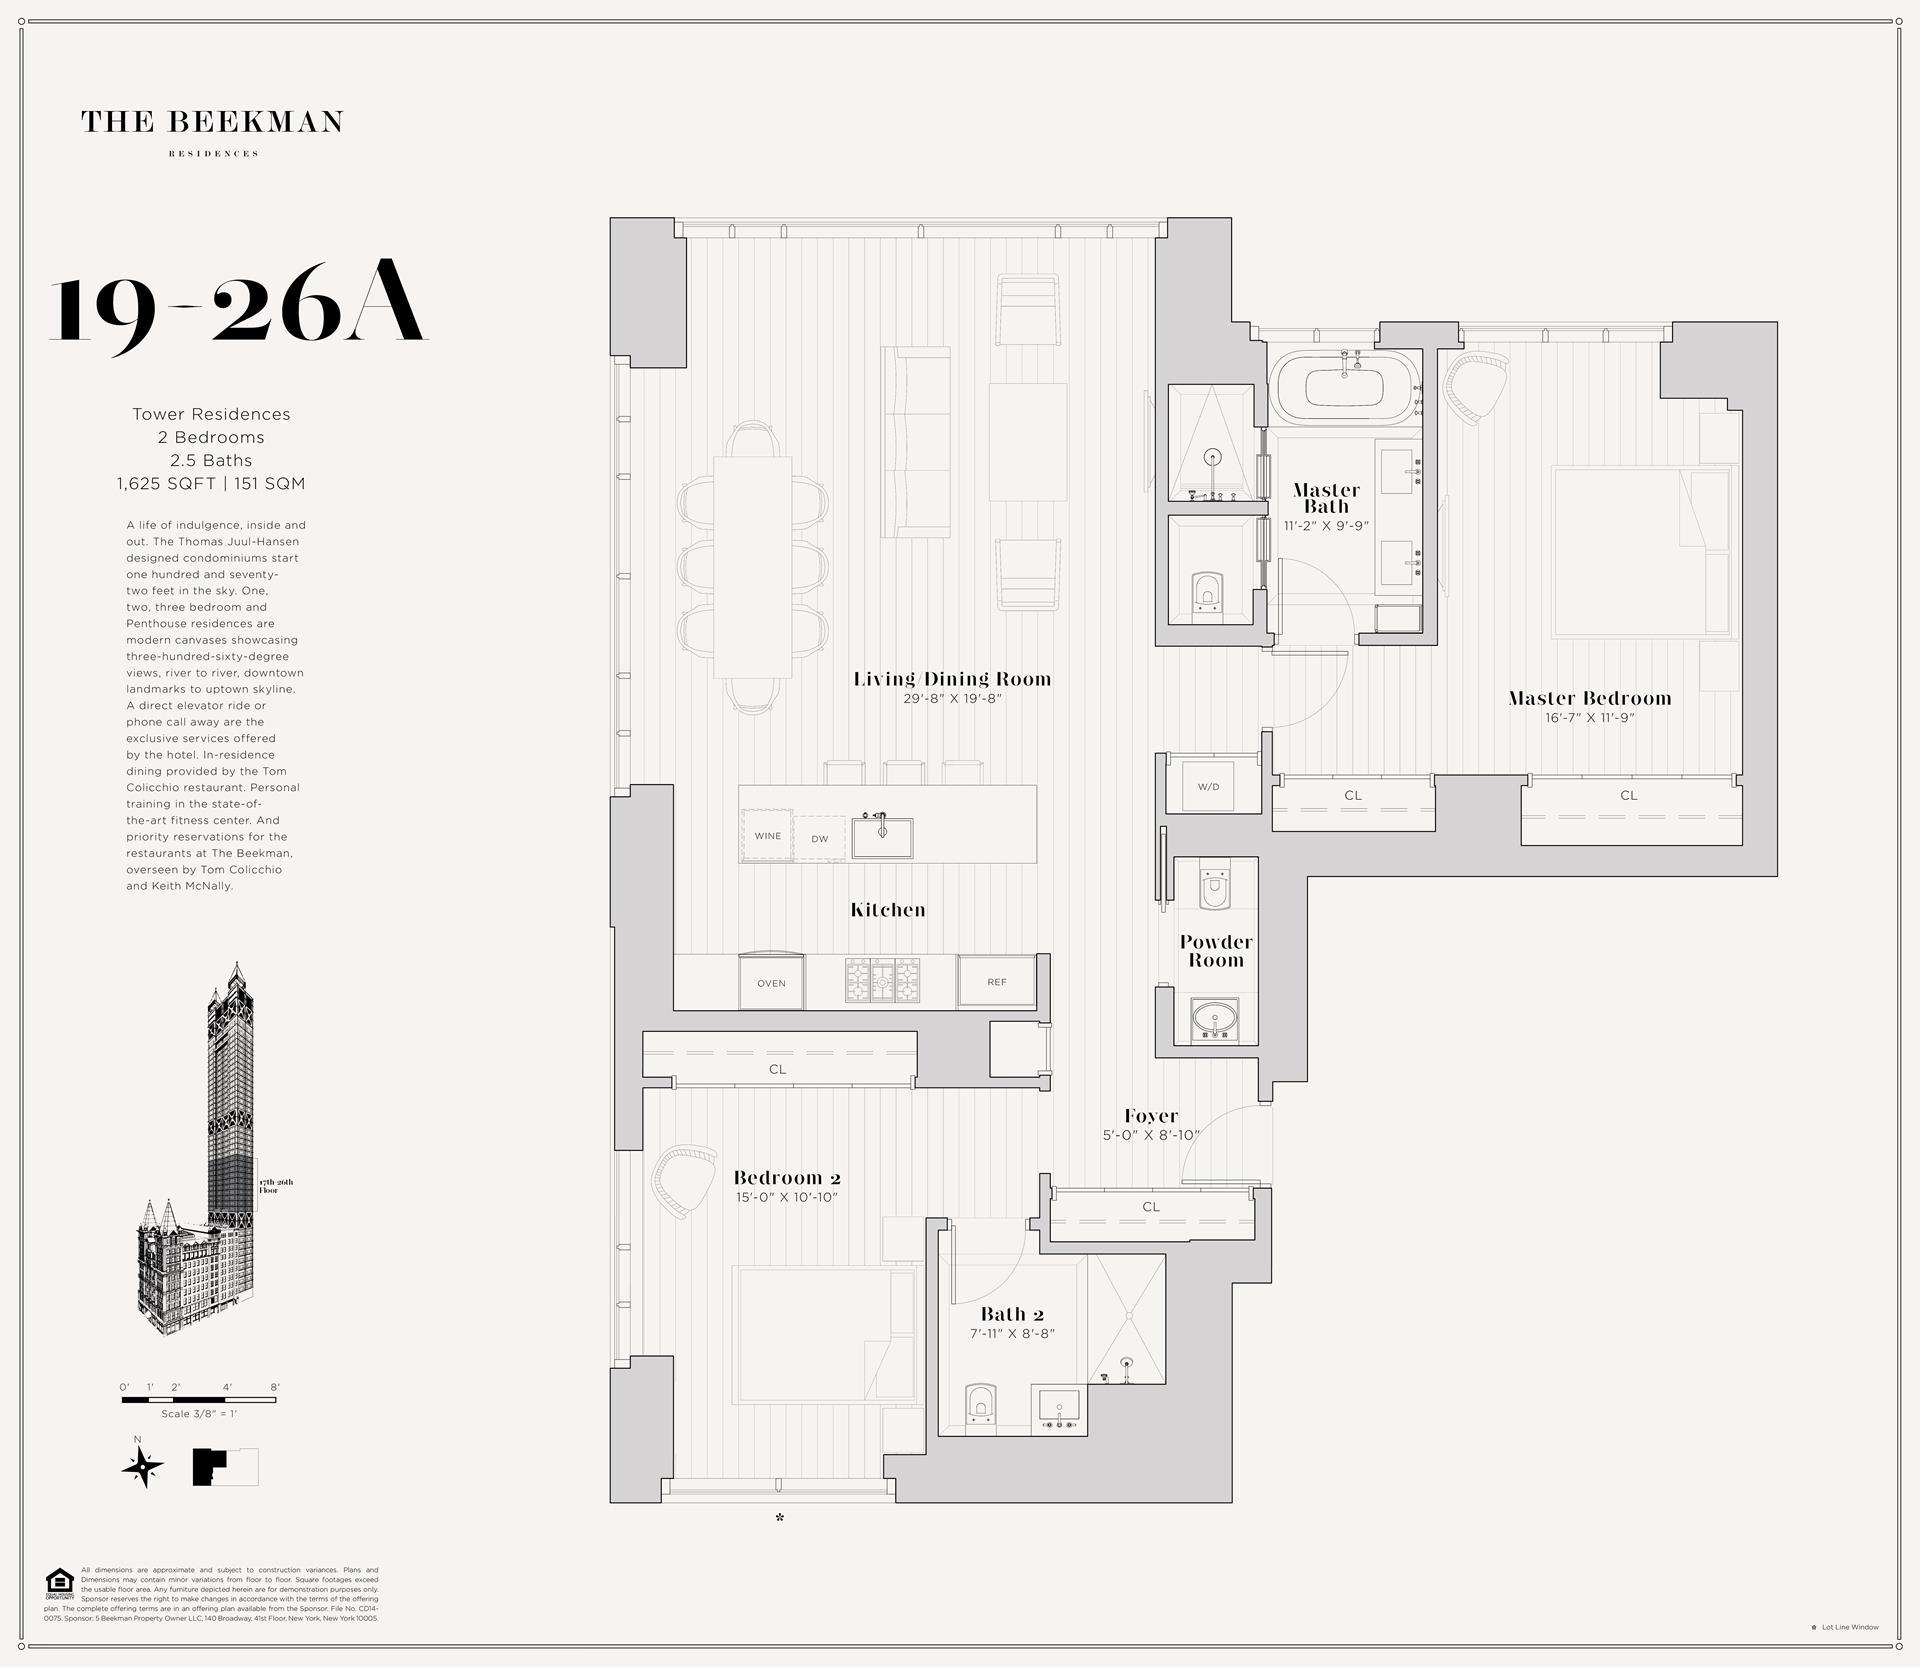 Floor plan of The Beekman Residences, 5 Beekman St, 23A - Financial District, New York